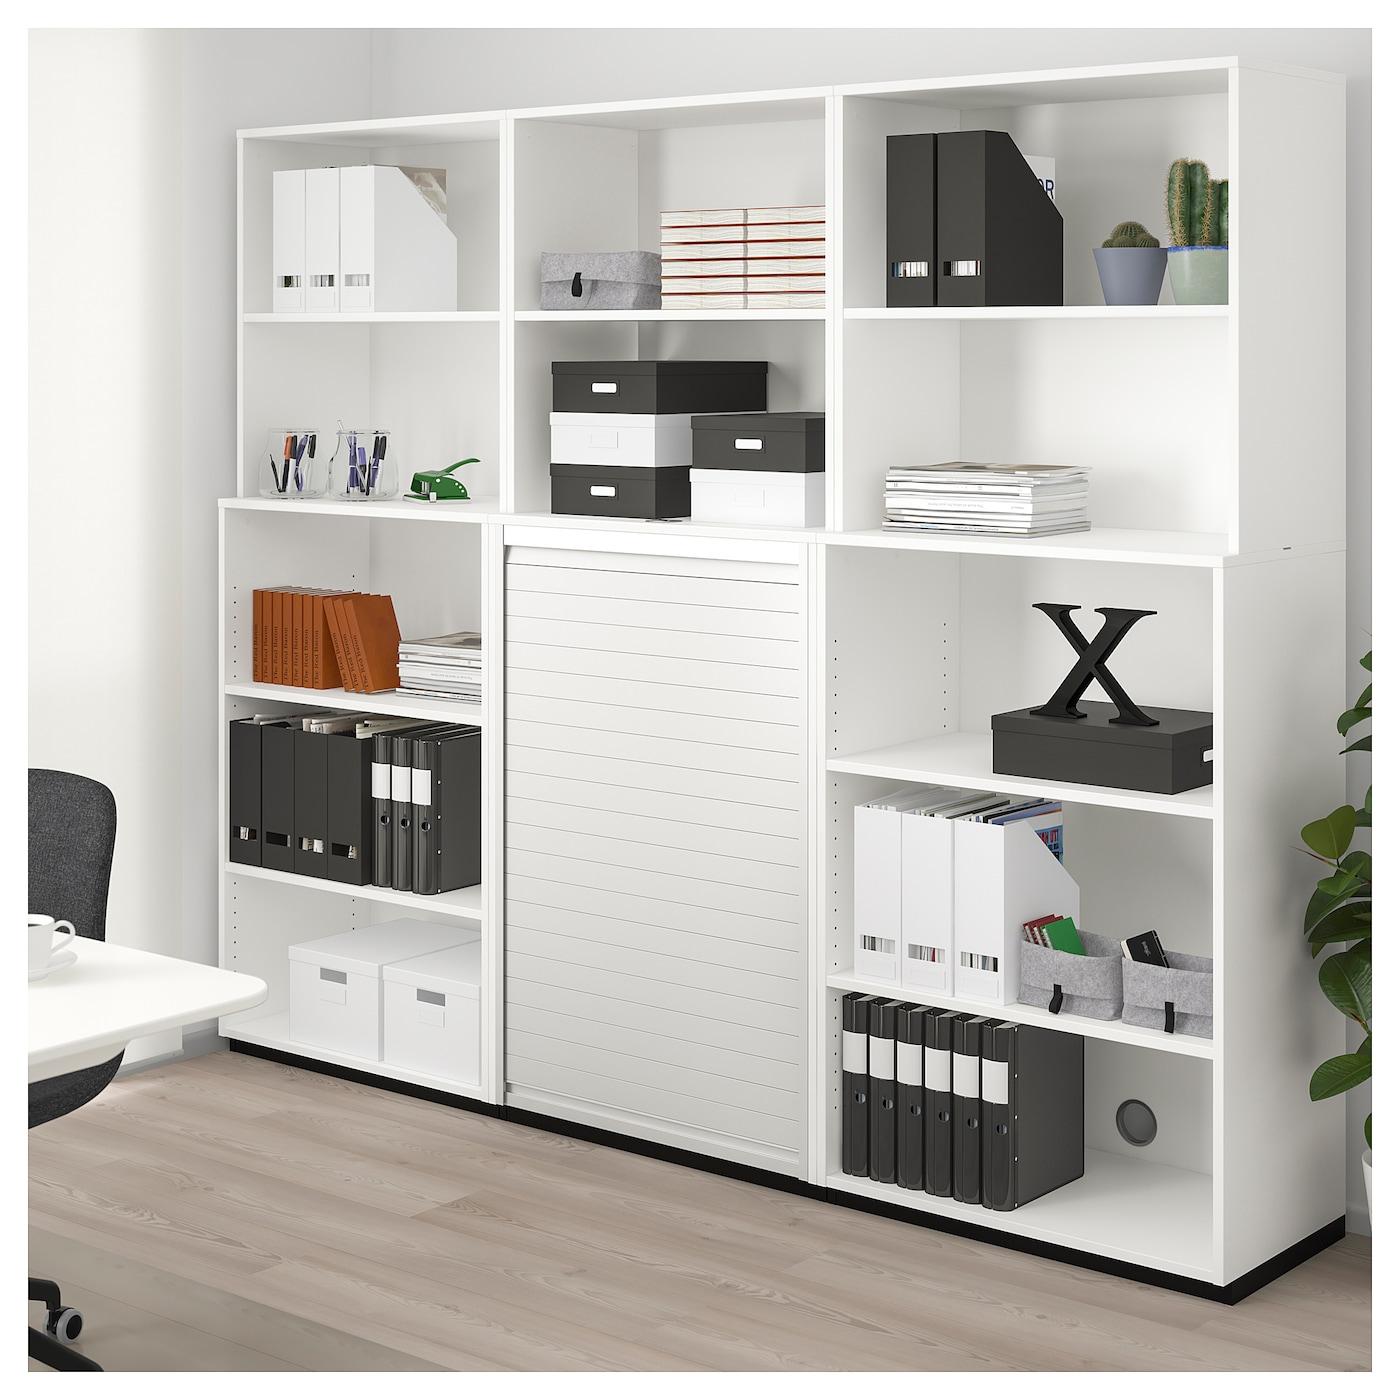 galant open storage combination white 160x200 cm ikea. Black Bedroom Furniture Sets. Home Design Ideas